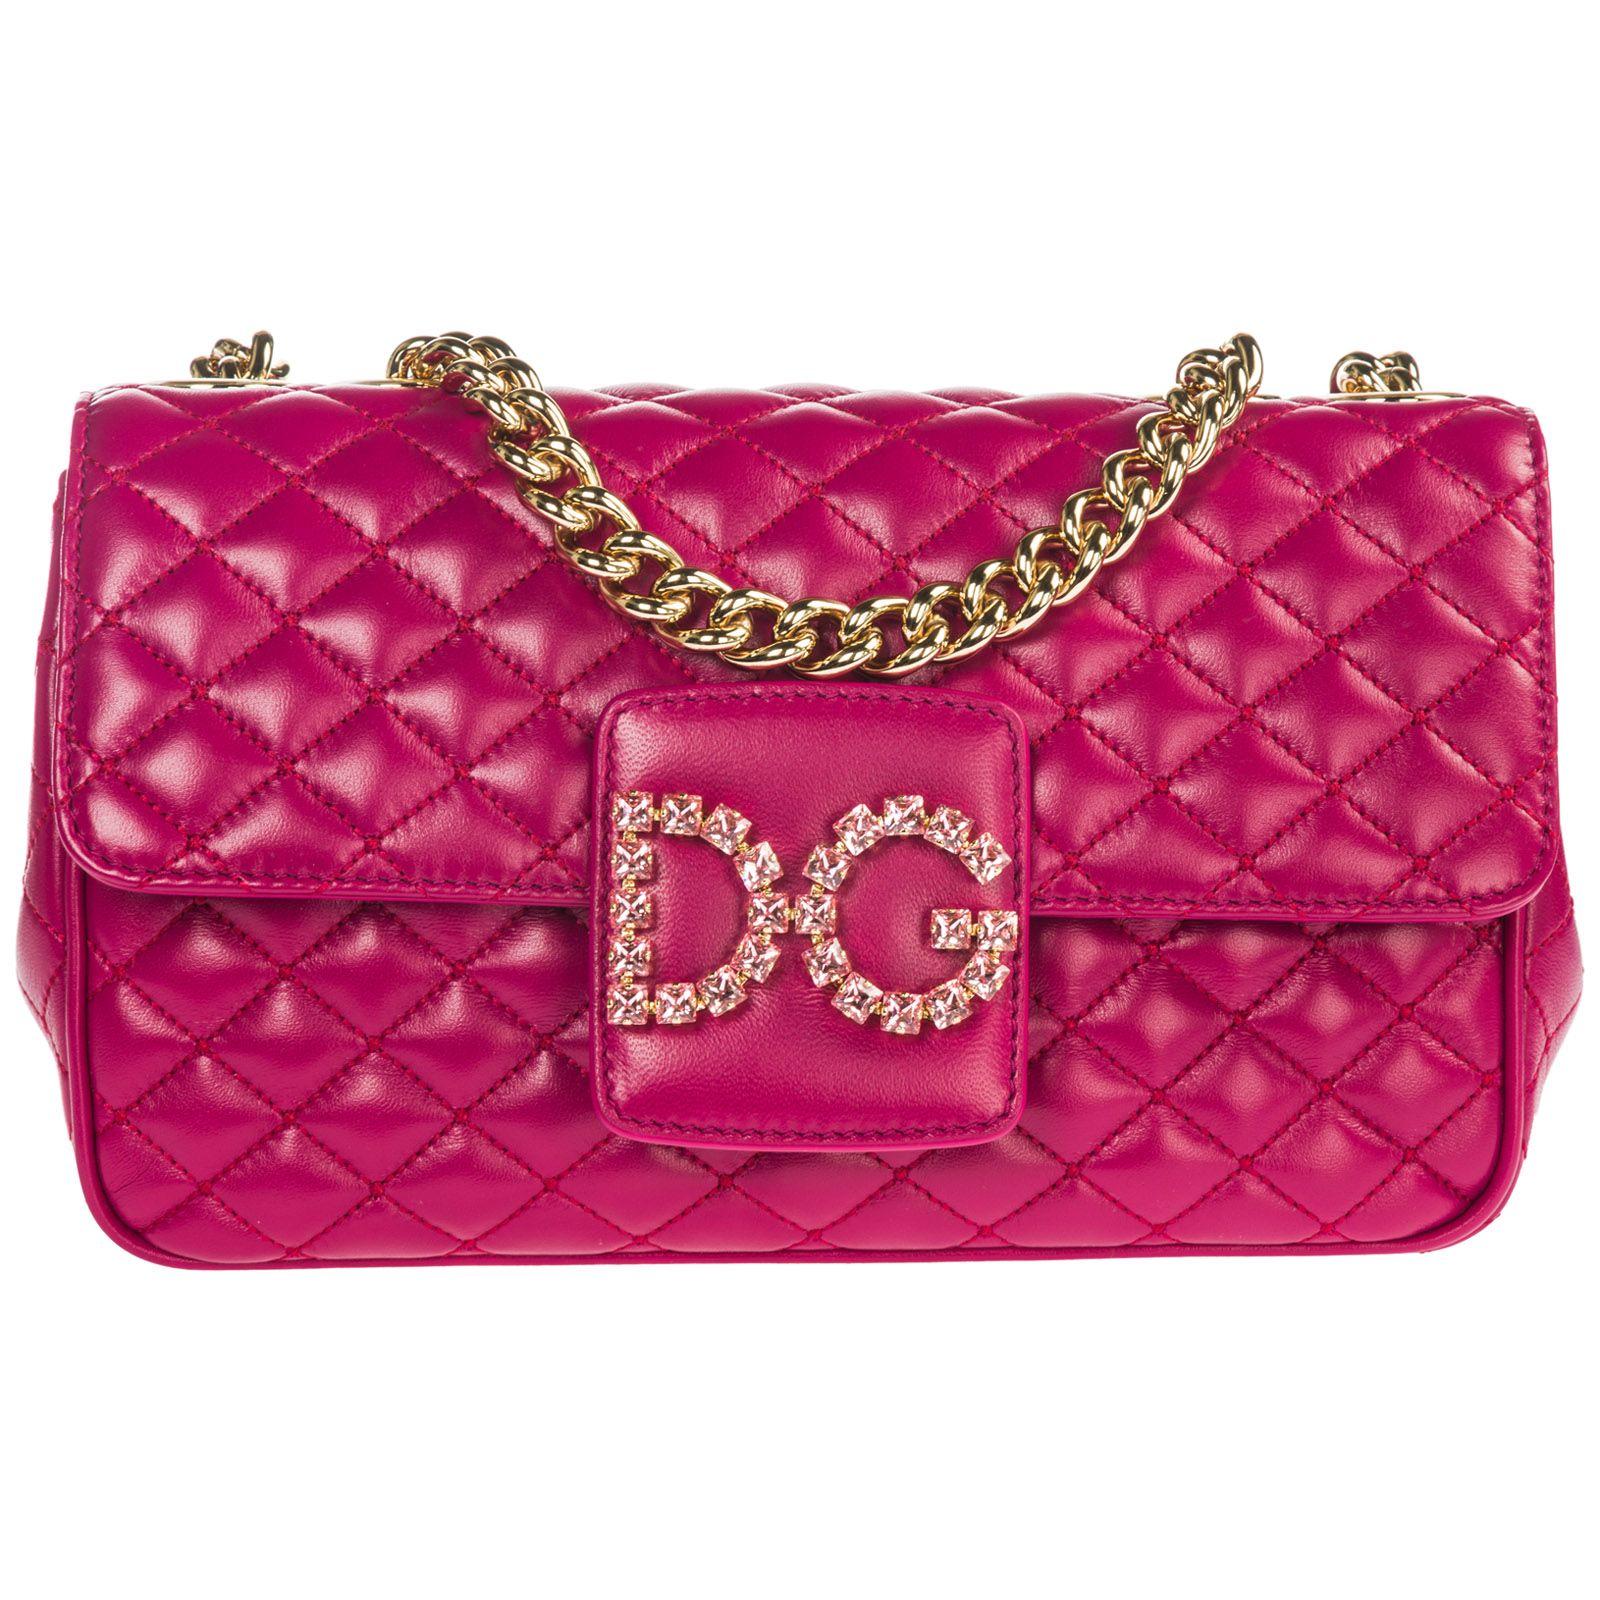 33d5c338dd7 Dolce & Gabbana Dolce & Gabbana Leather Shoulder Bag Dg Millennials ...